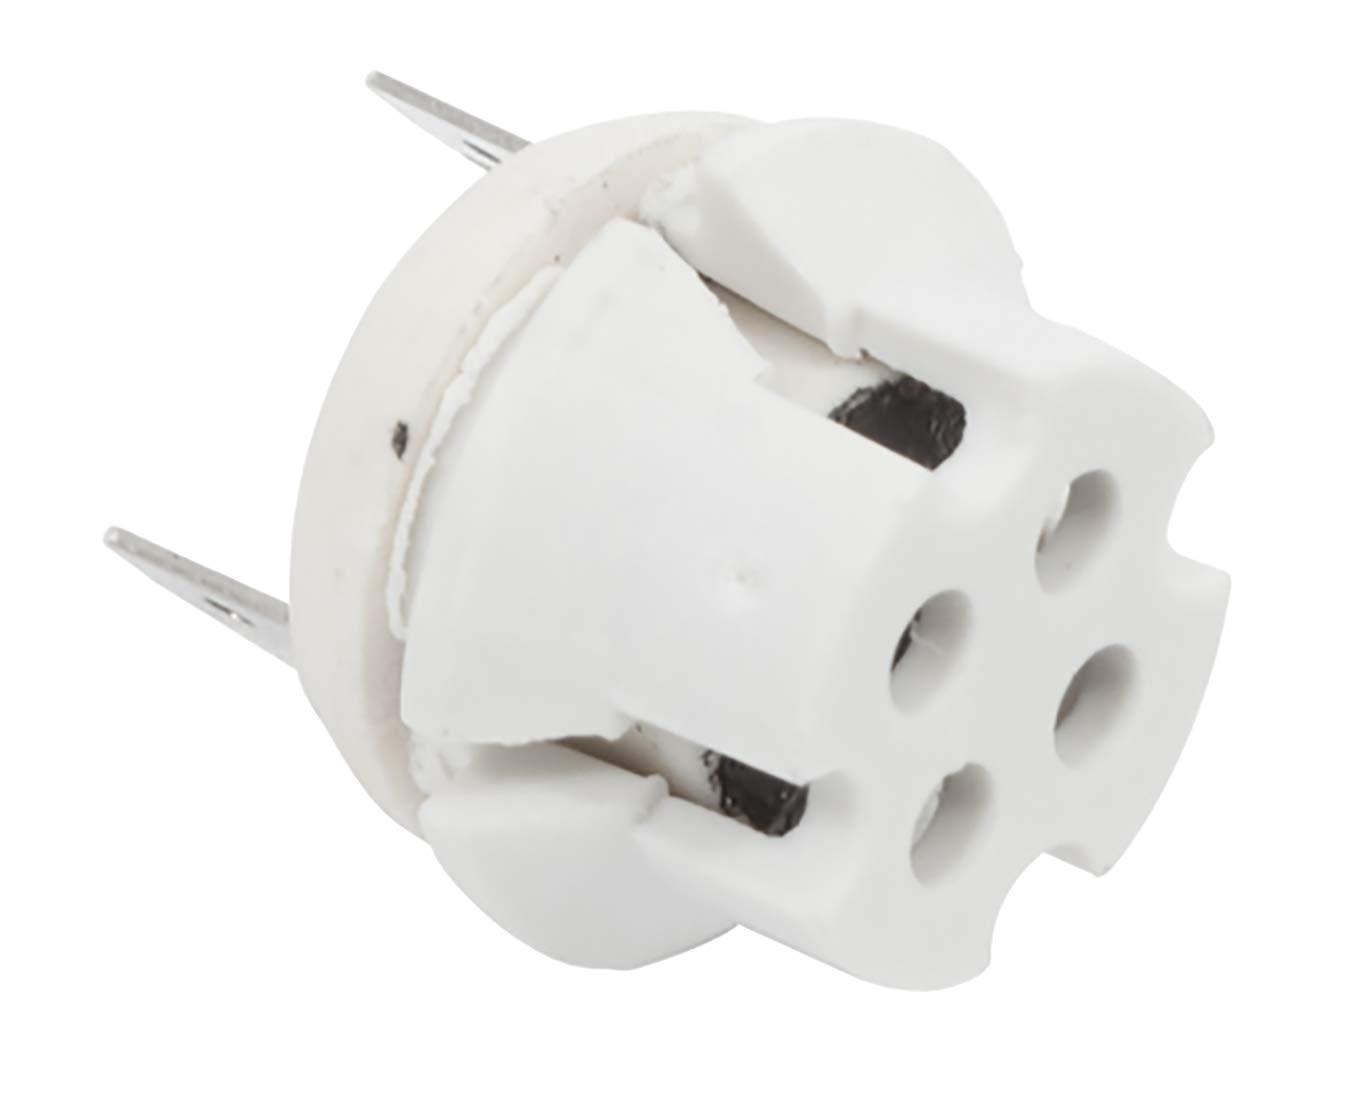 Bradford White OEM Flammable Vapor Sensor 239-45560-00 Water Heater Replacement Part 2394556000 by Bradford White